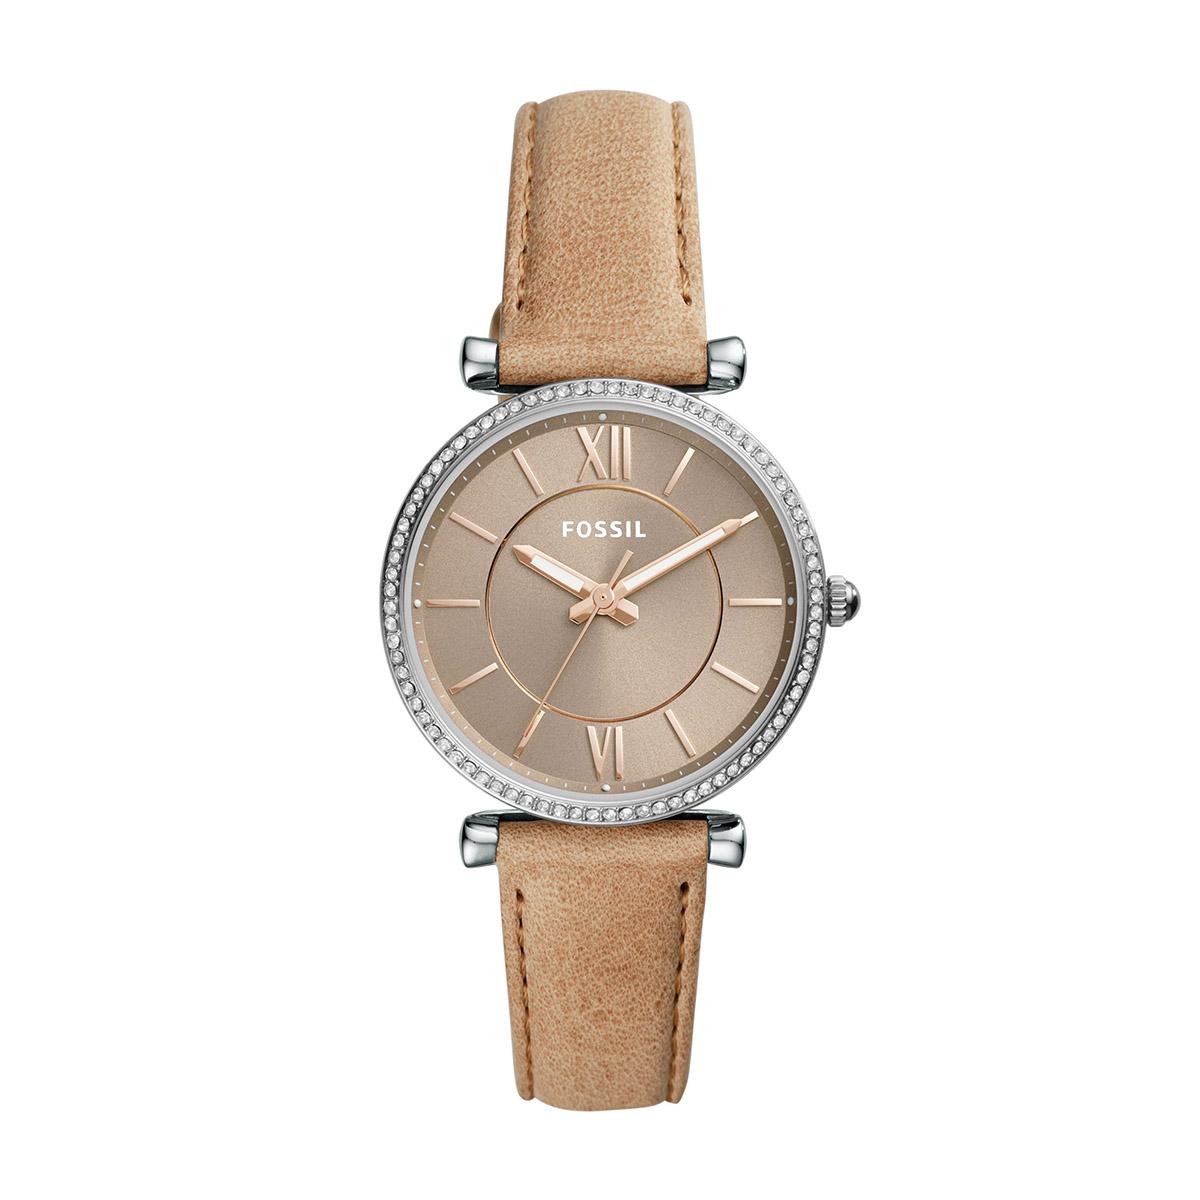 Wristwatch Fossil Tailor Es4394 Blue Rose Gold Womens Watches Perfect Boyfriend Es4093 Navy